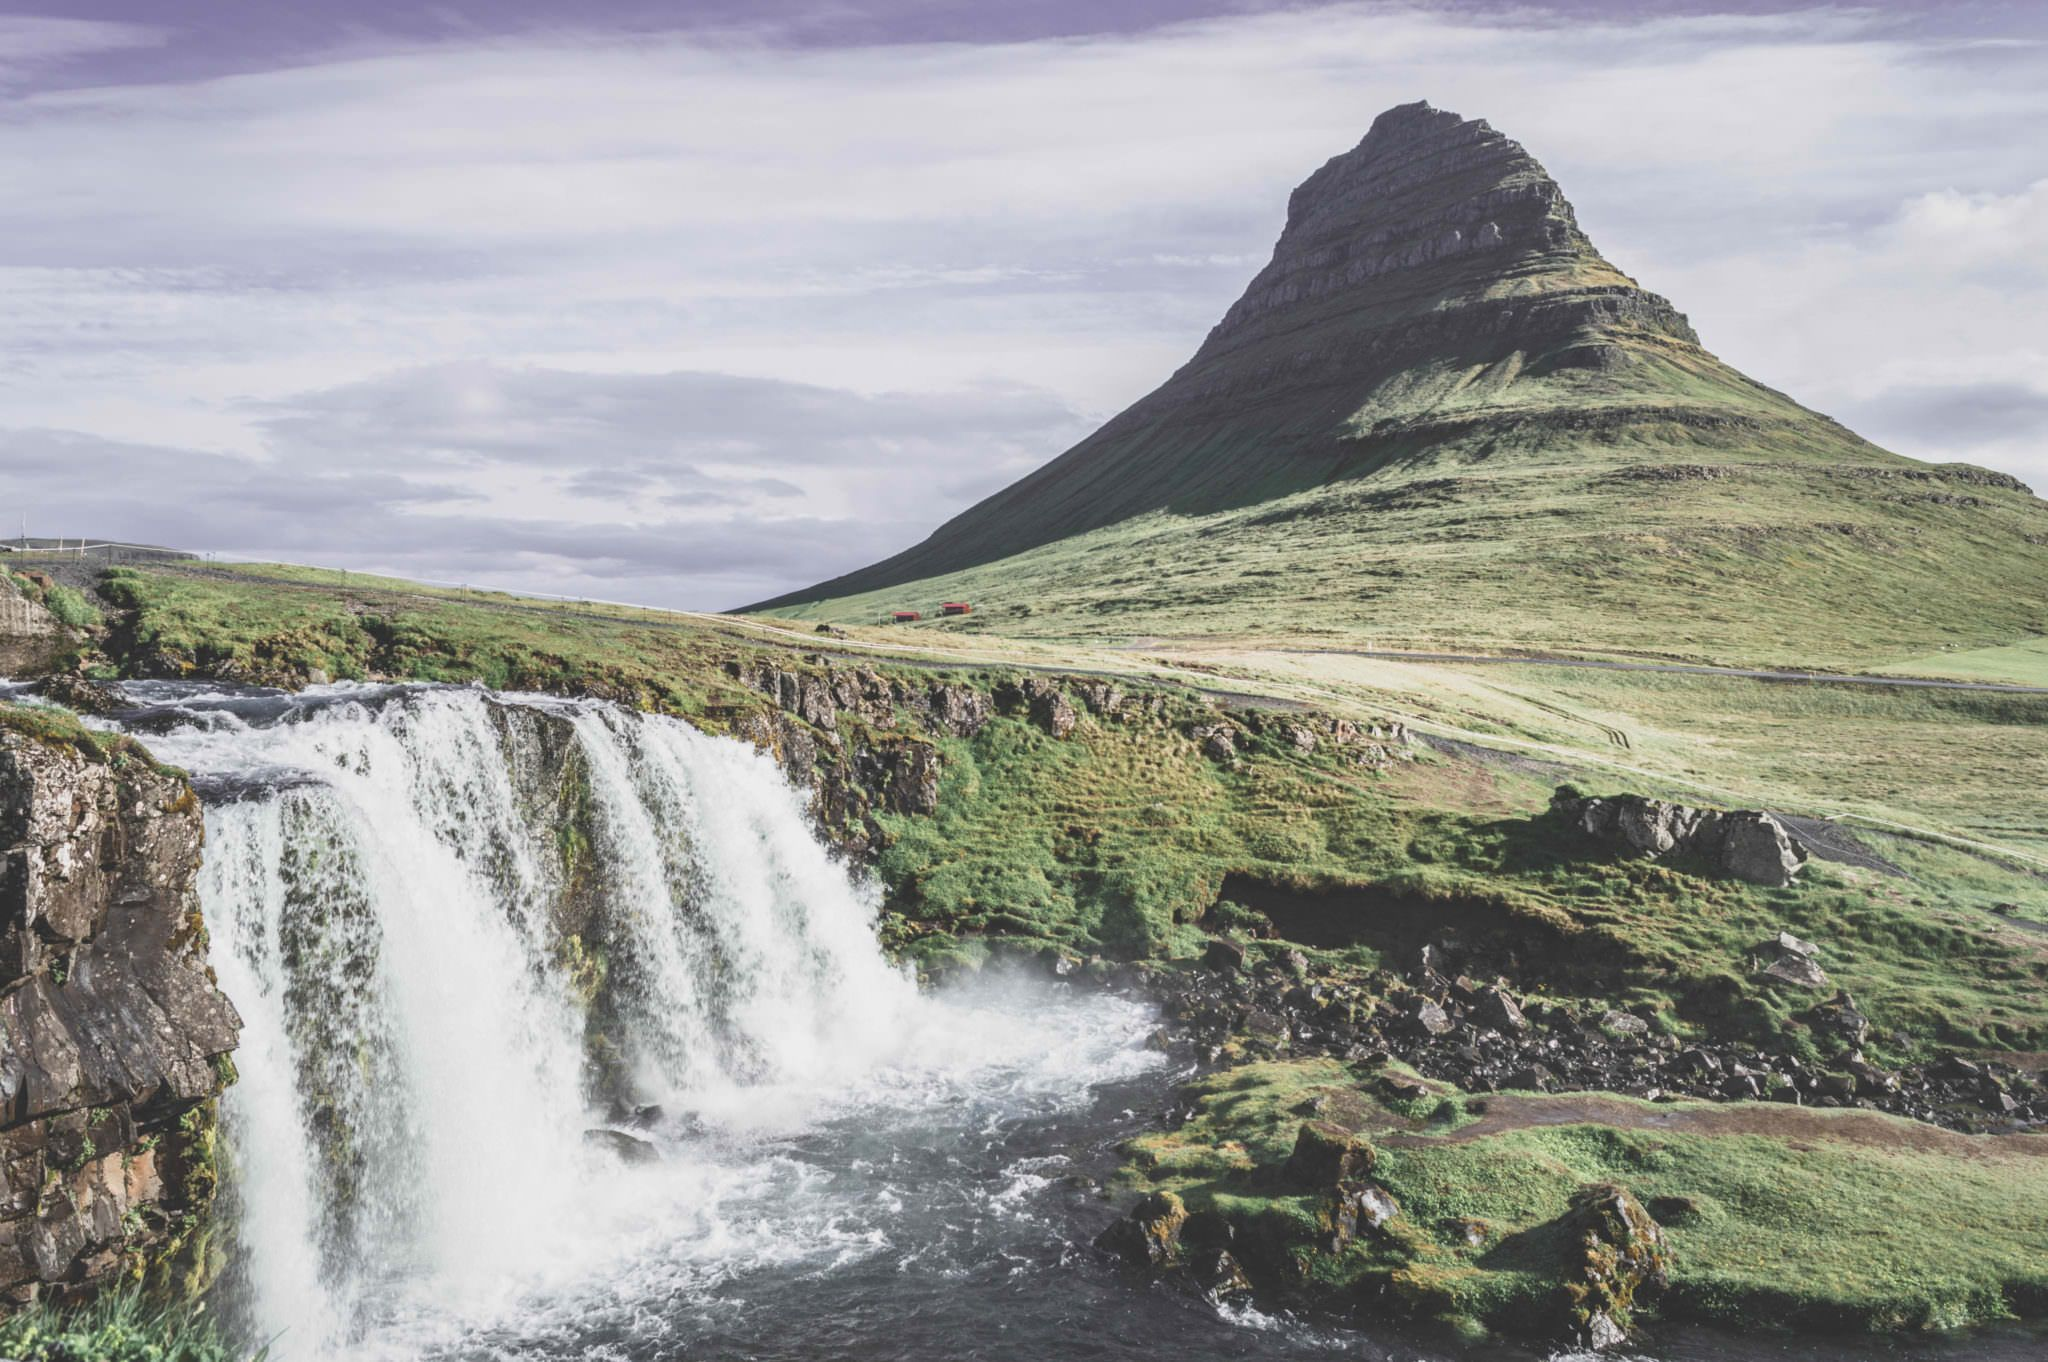 Péninsule de Snæfellsnes / Snæfellsnes peninsula / Kirkjufell